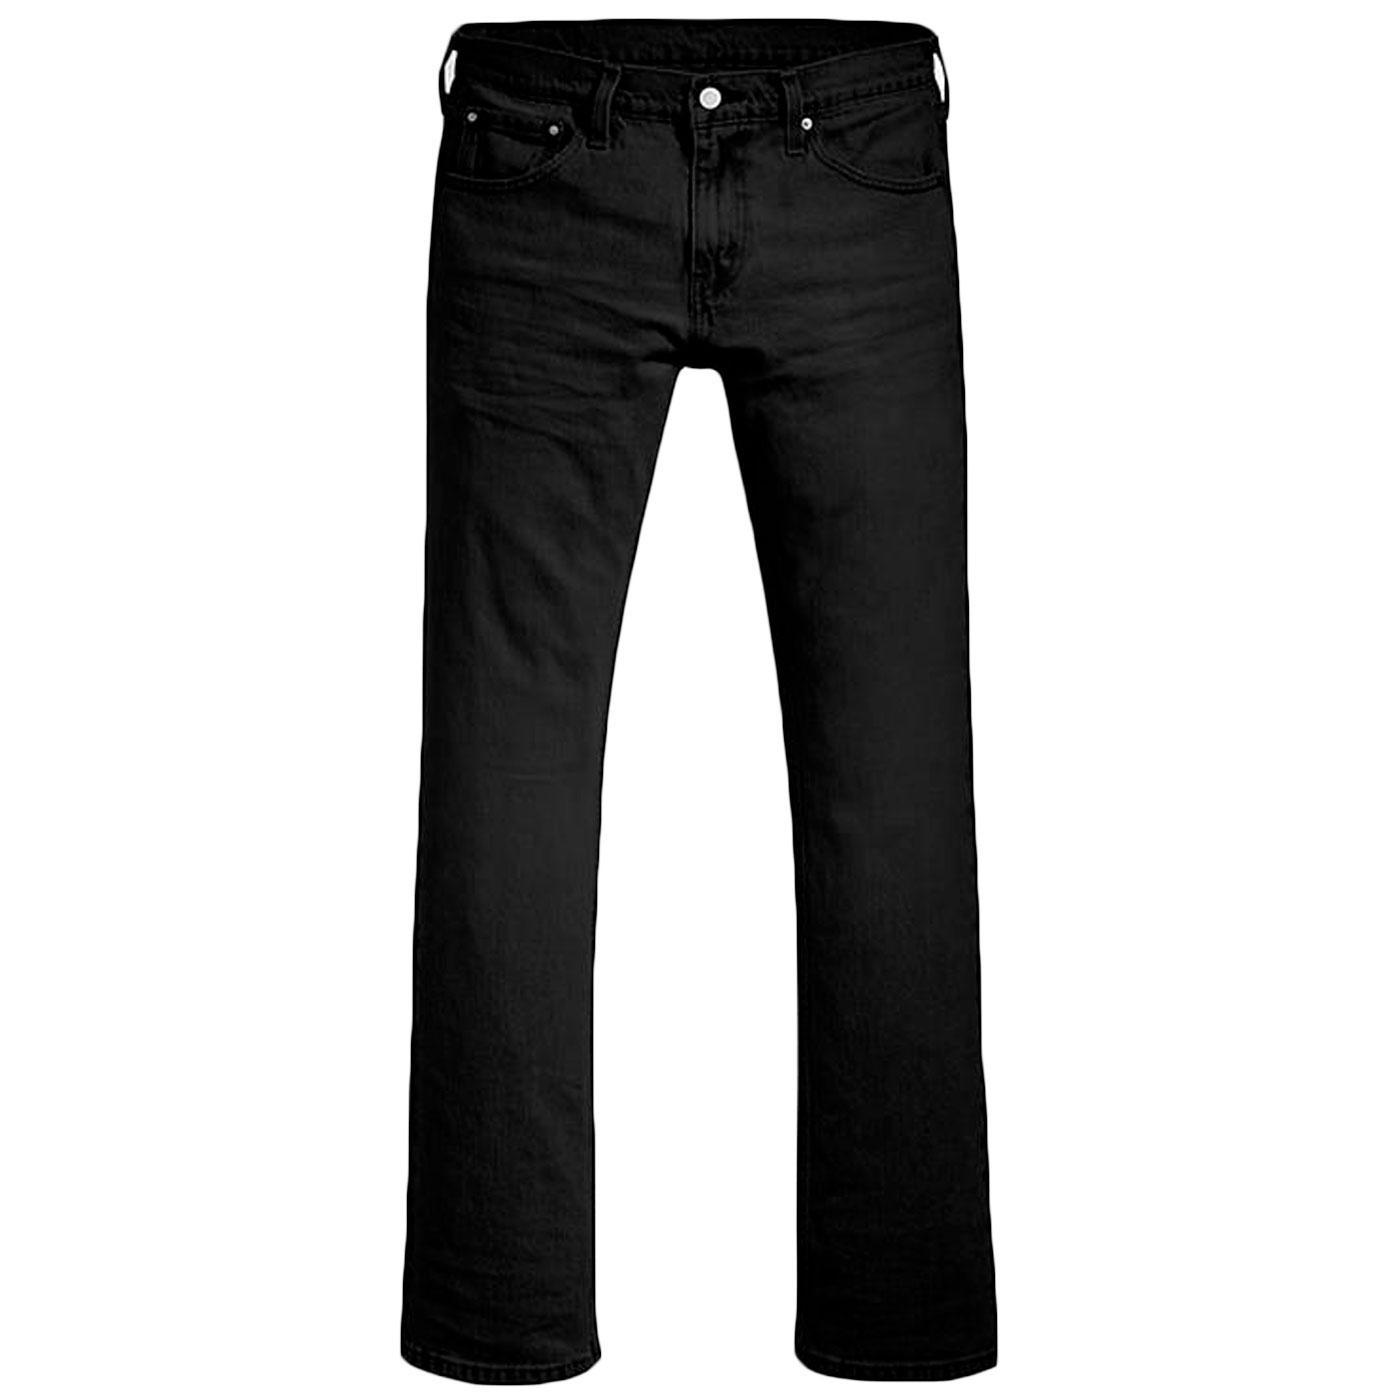 LEVI'S 527 Retro Slim Bootcut Jeans (Nightshine)